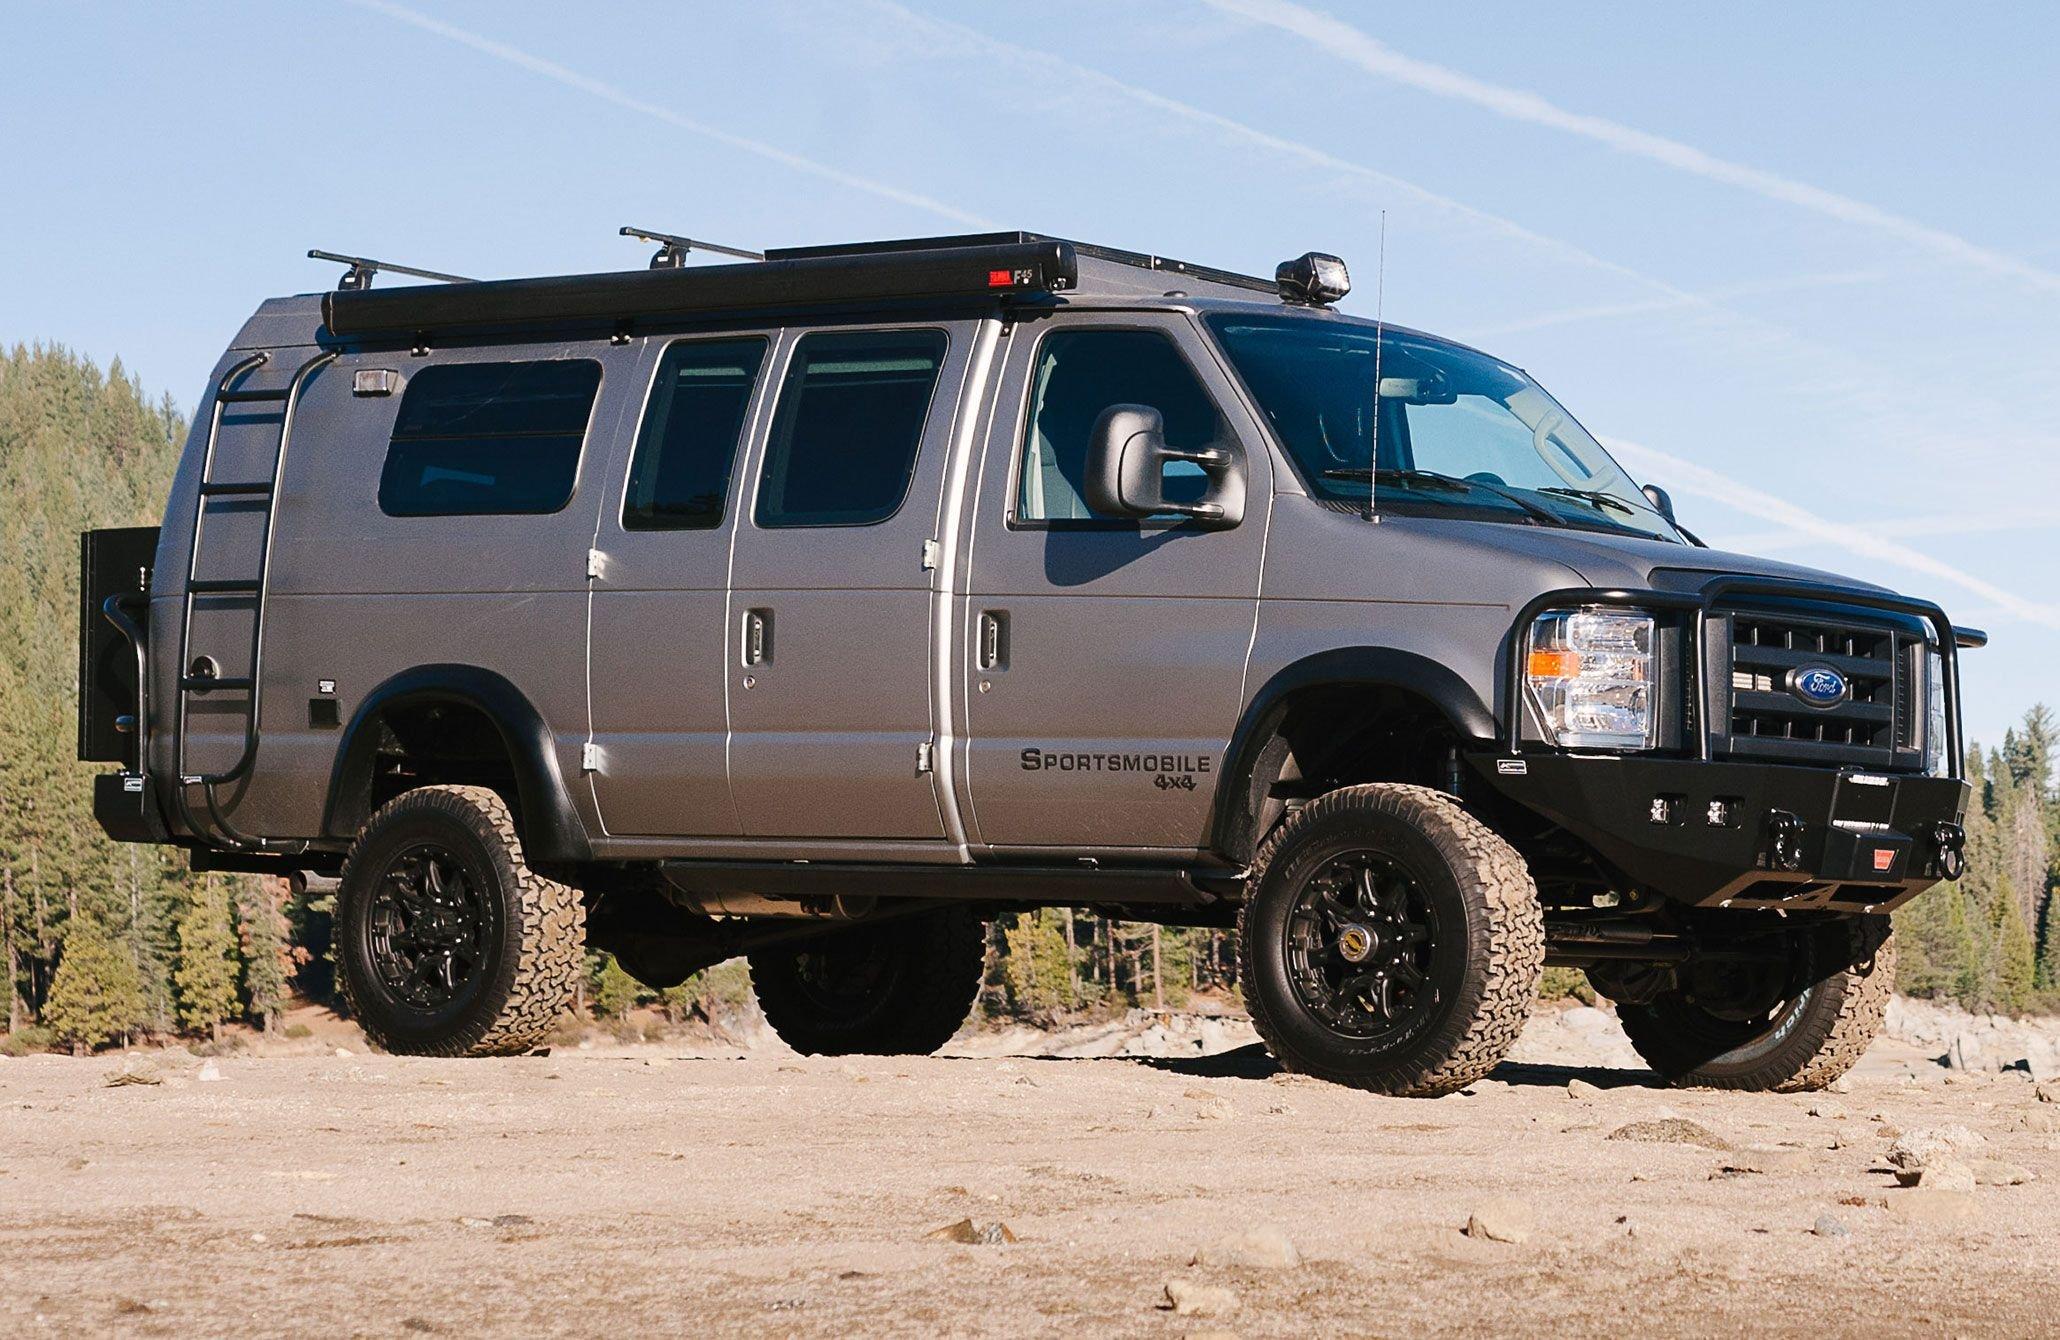 4 Wheel Drive Vans >> 2015 Sportsmobile Ford E-350 van camper motorhome 4x4 f350 wallpaper | 2060x1340 | 859745 ...